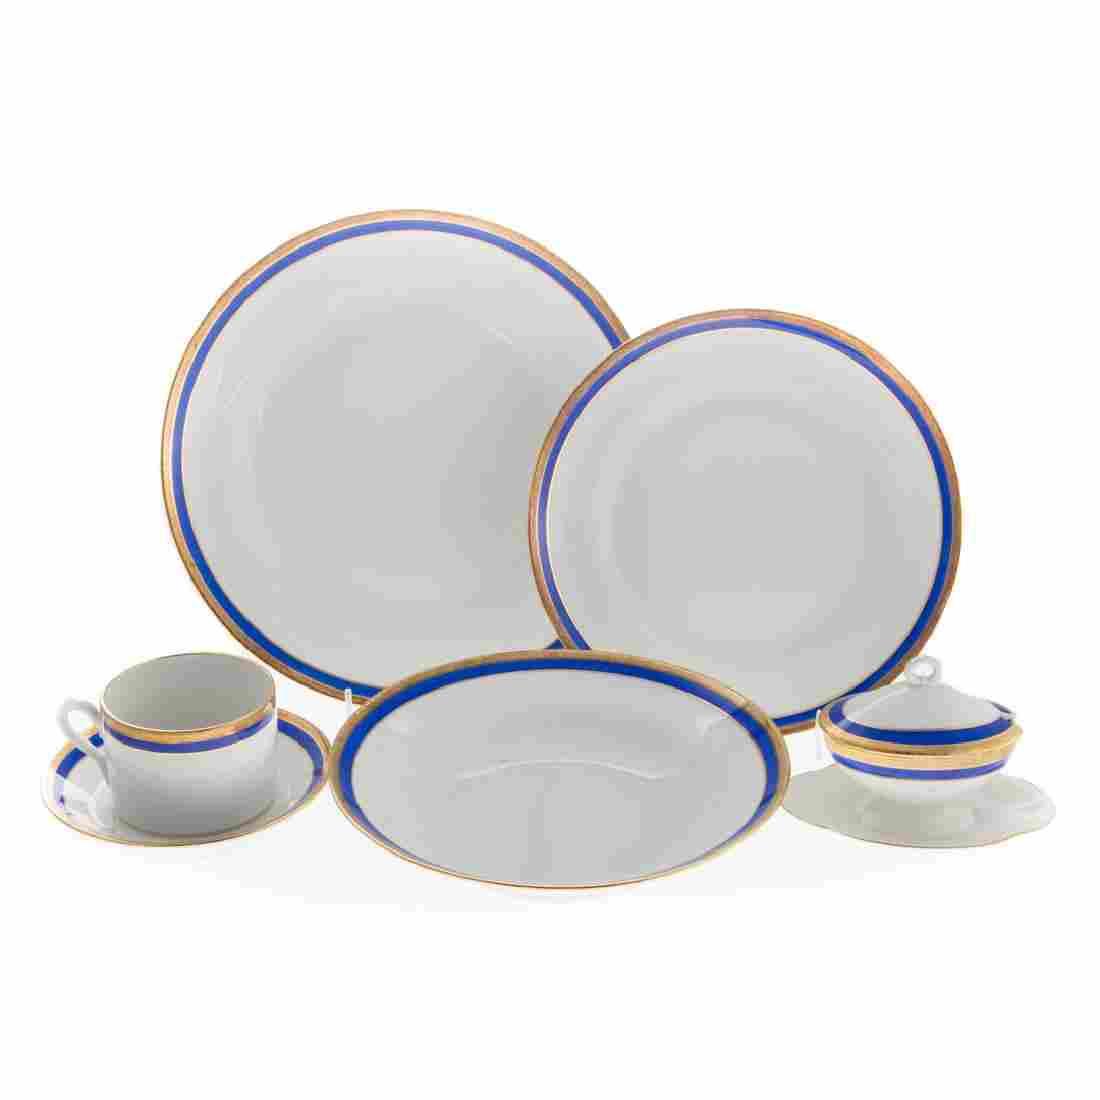 Richard Ginori porcelain dinner service